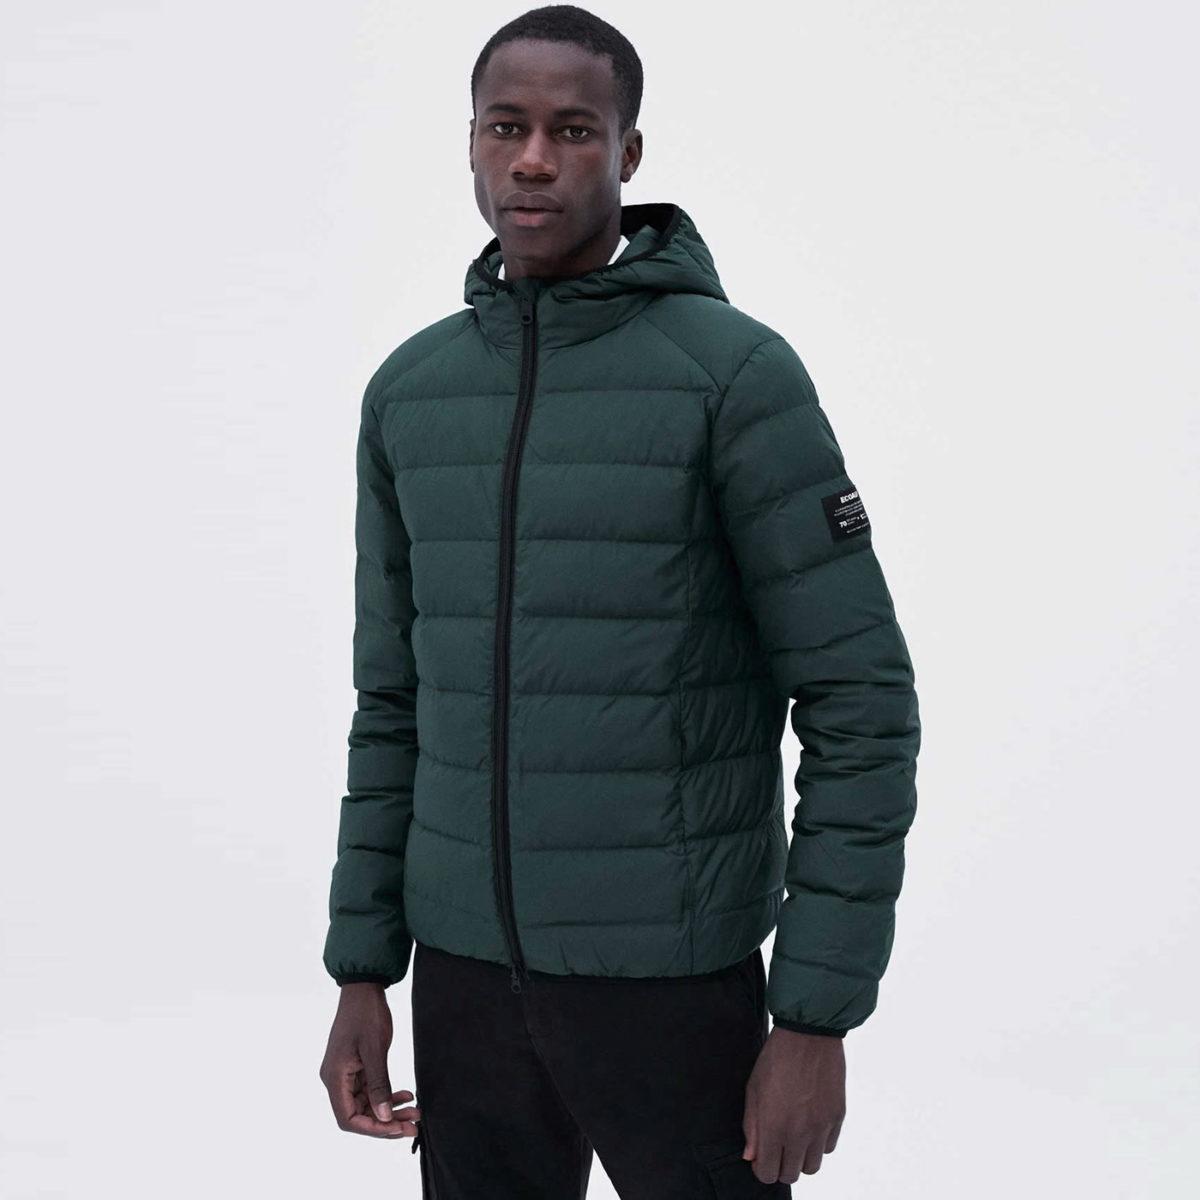 ecoalf dunjacka herr ASP jacker korean green återvunnen polyester